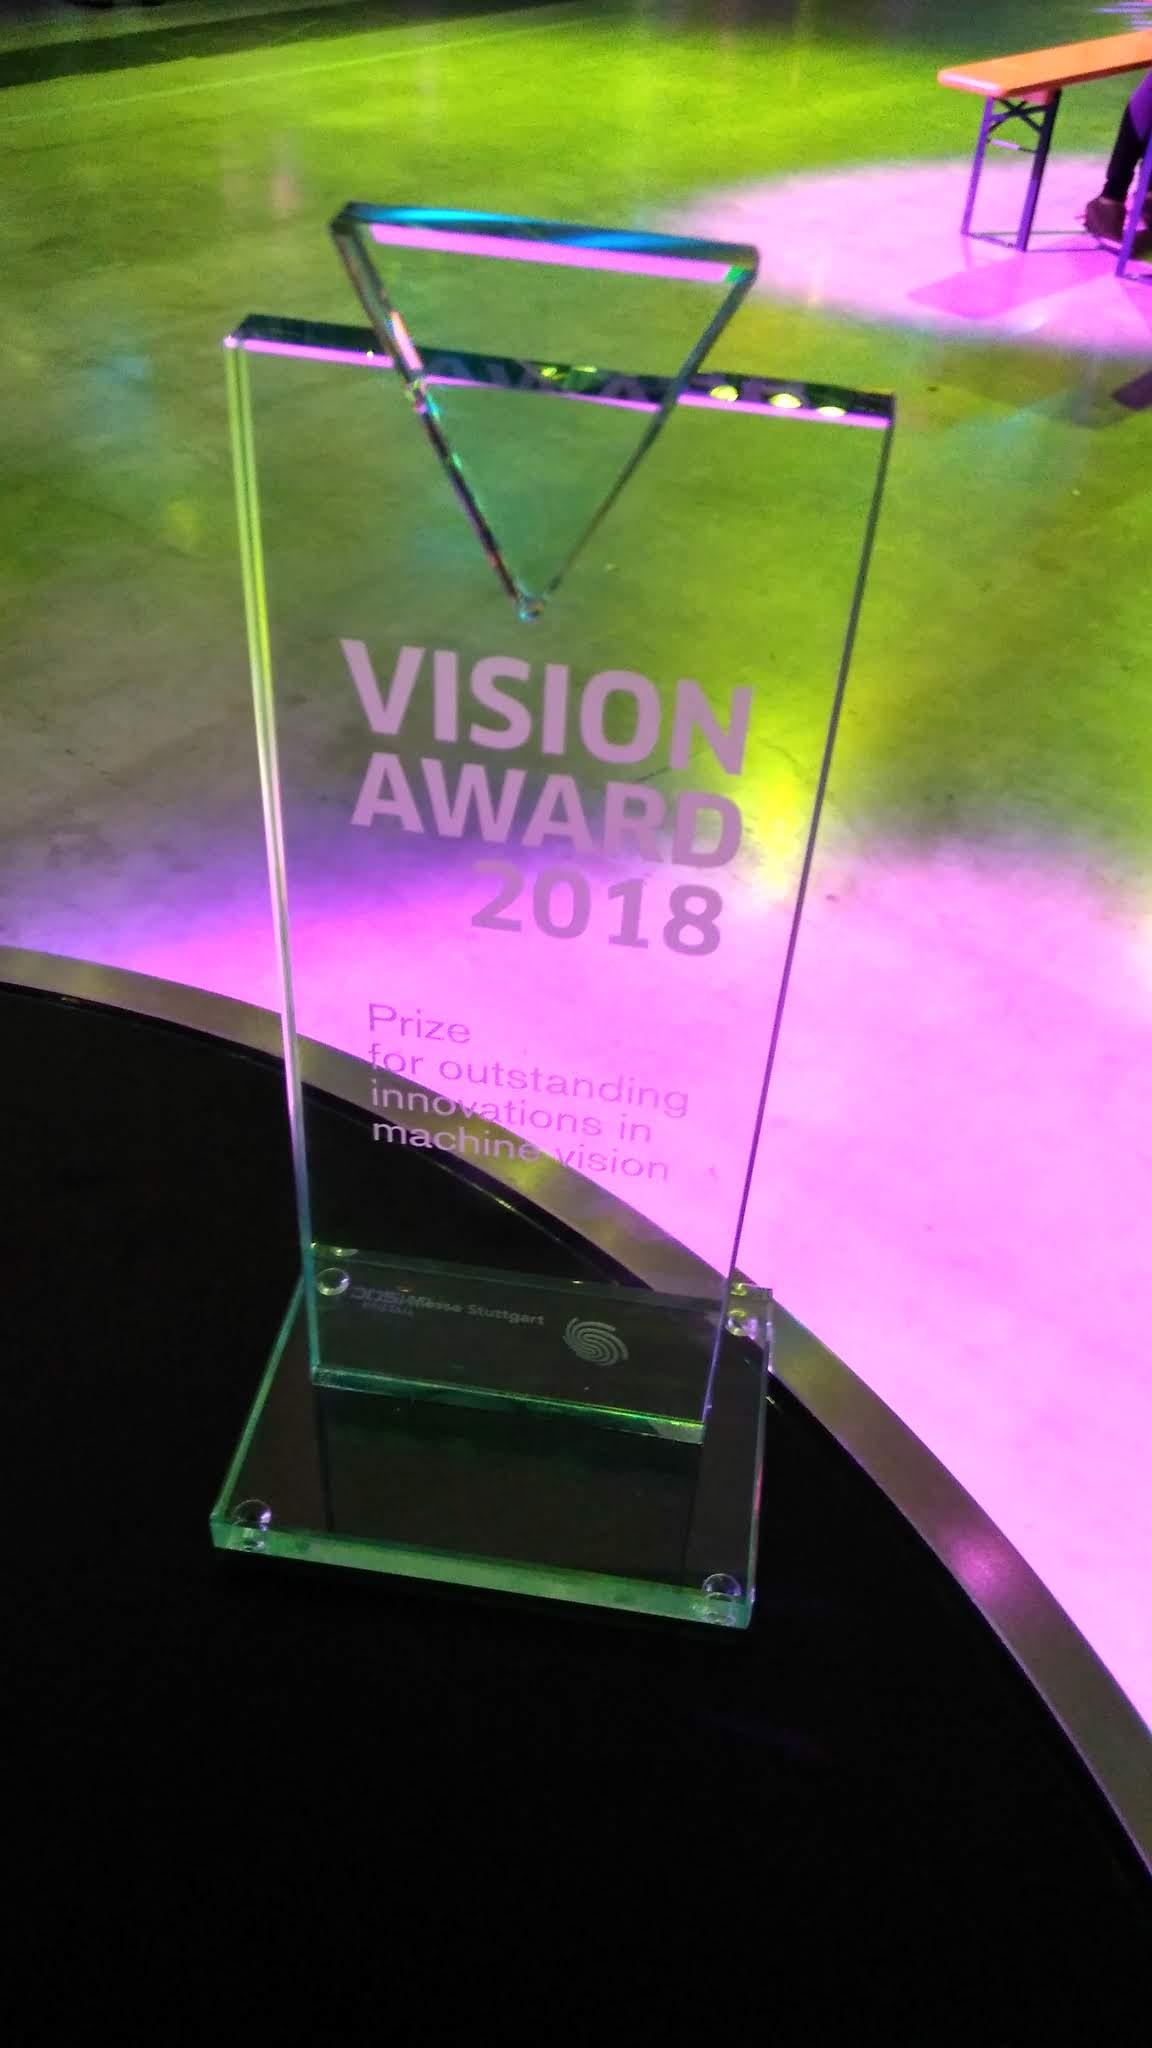 The Vision Award - ceremony